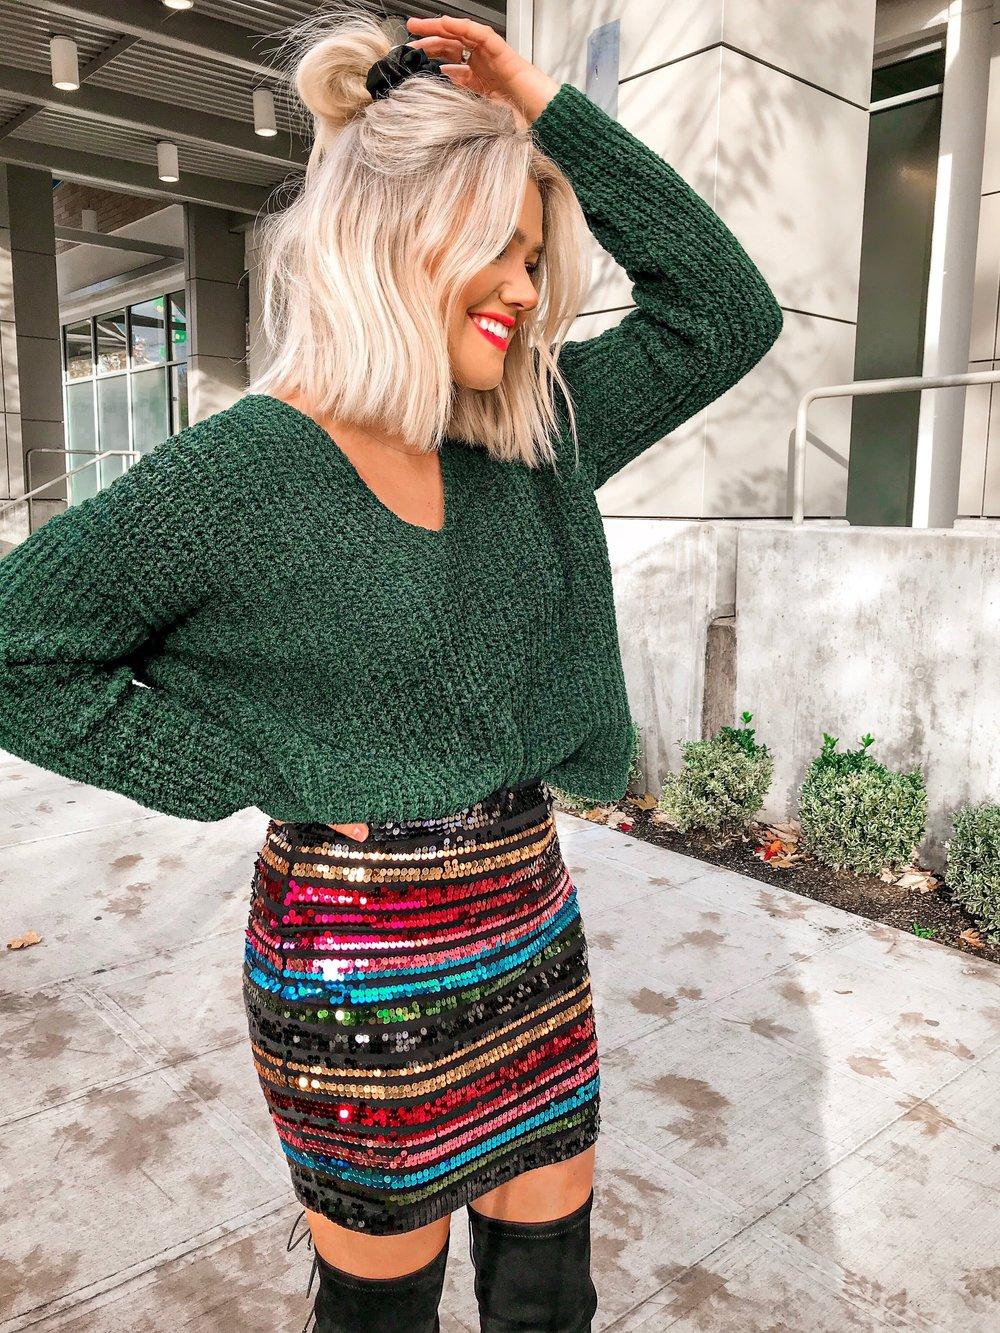 5f0fd1c2685f Bre Sheppard - Espress Holiday Style : Shimmer Skirt .JPG